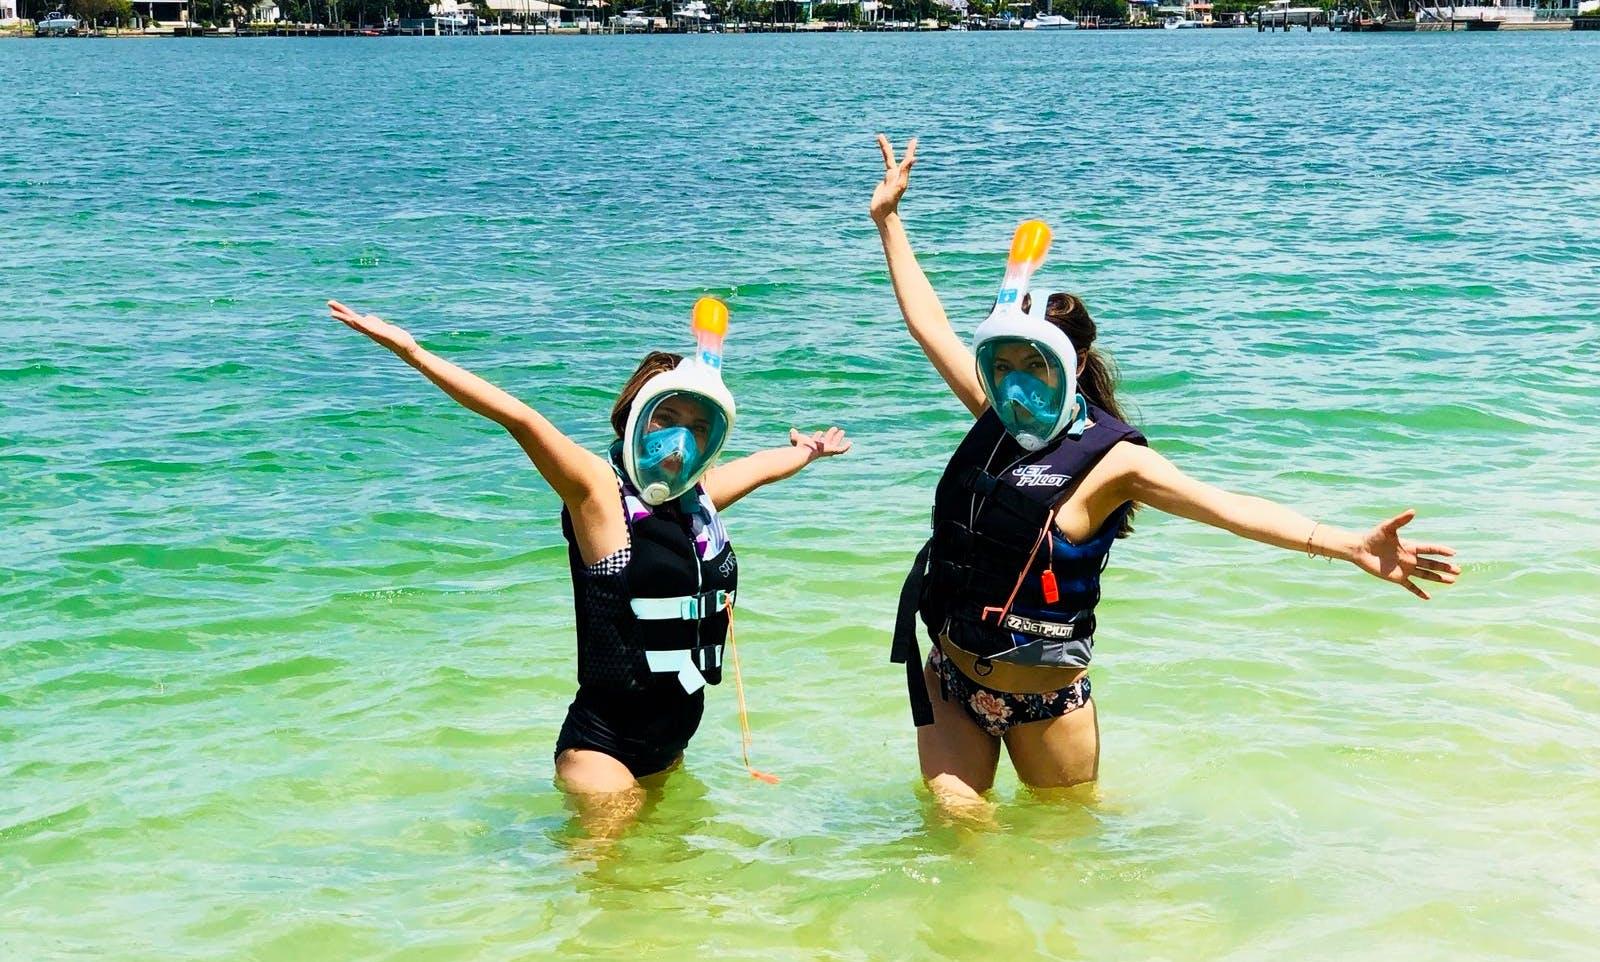 snorkeling tours in Miami Beach